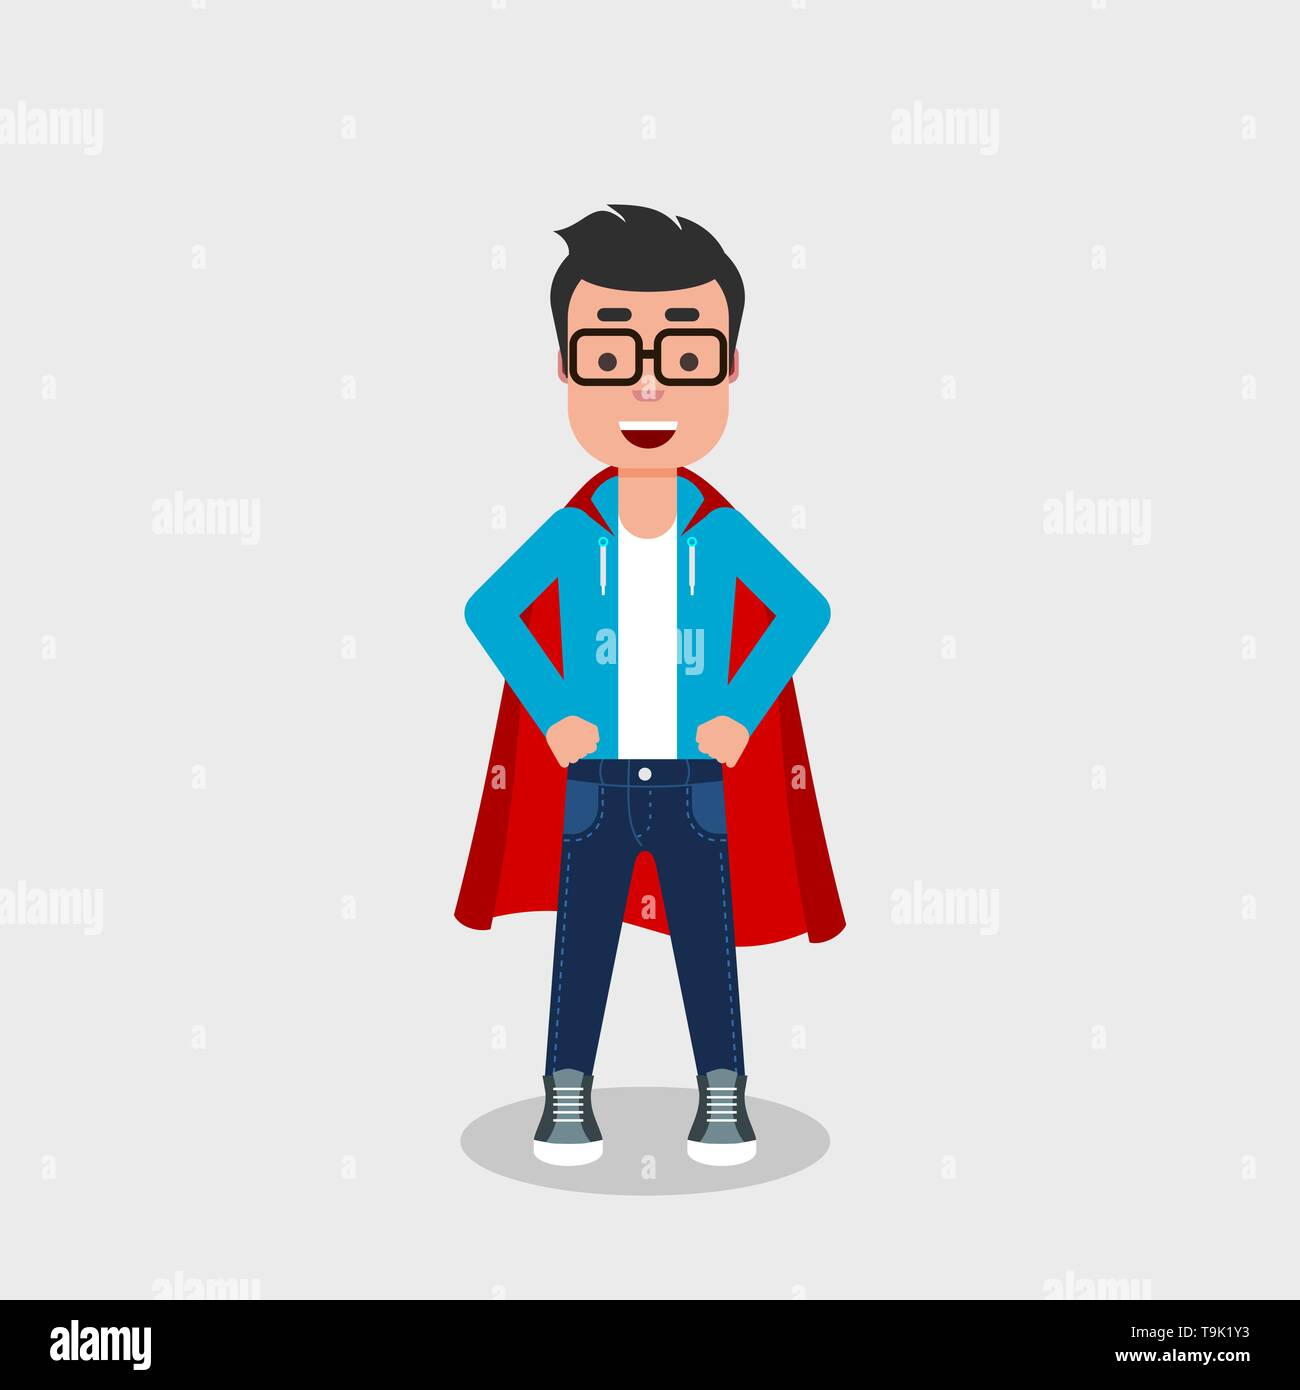 Young Cheerful Man Wearing A Superhero Costume Self